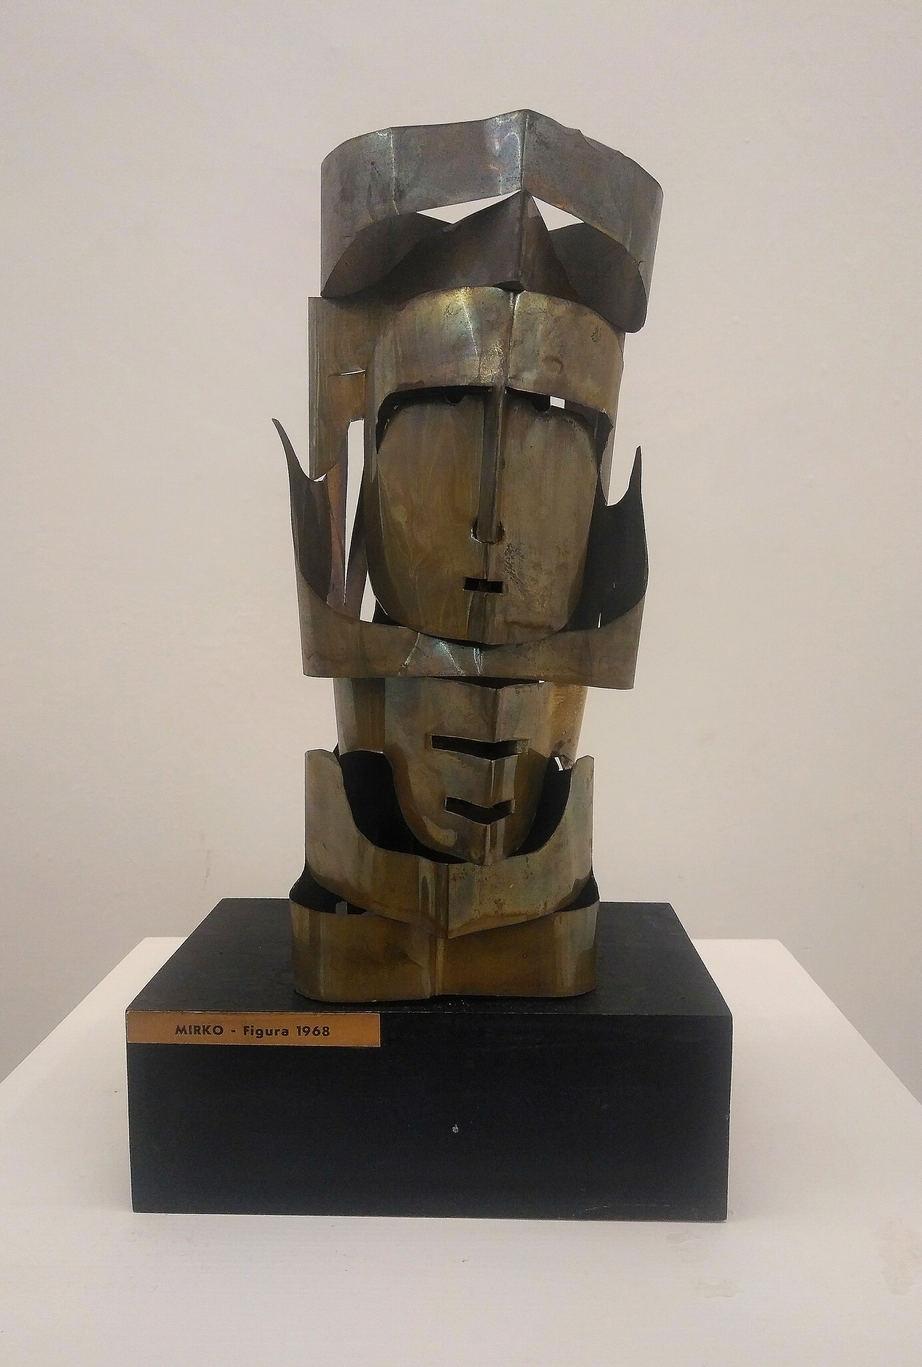 MIRKO BASALDELLA, Figura, 1968